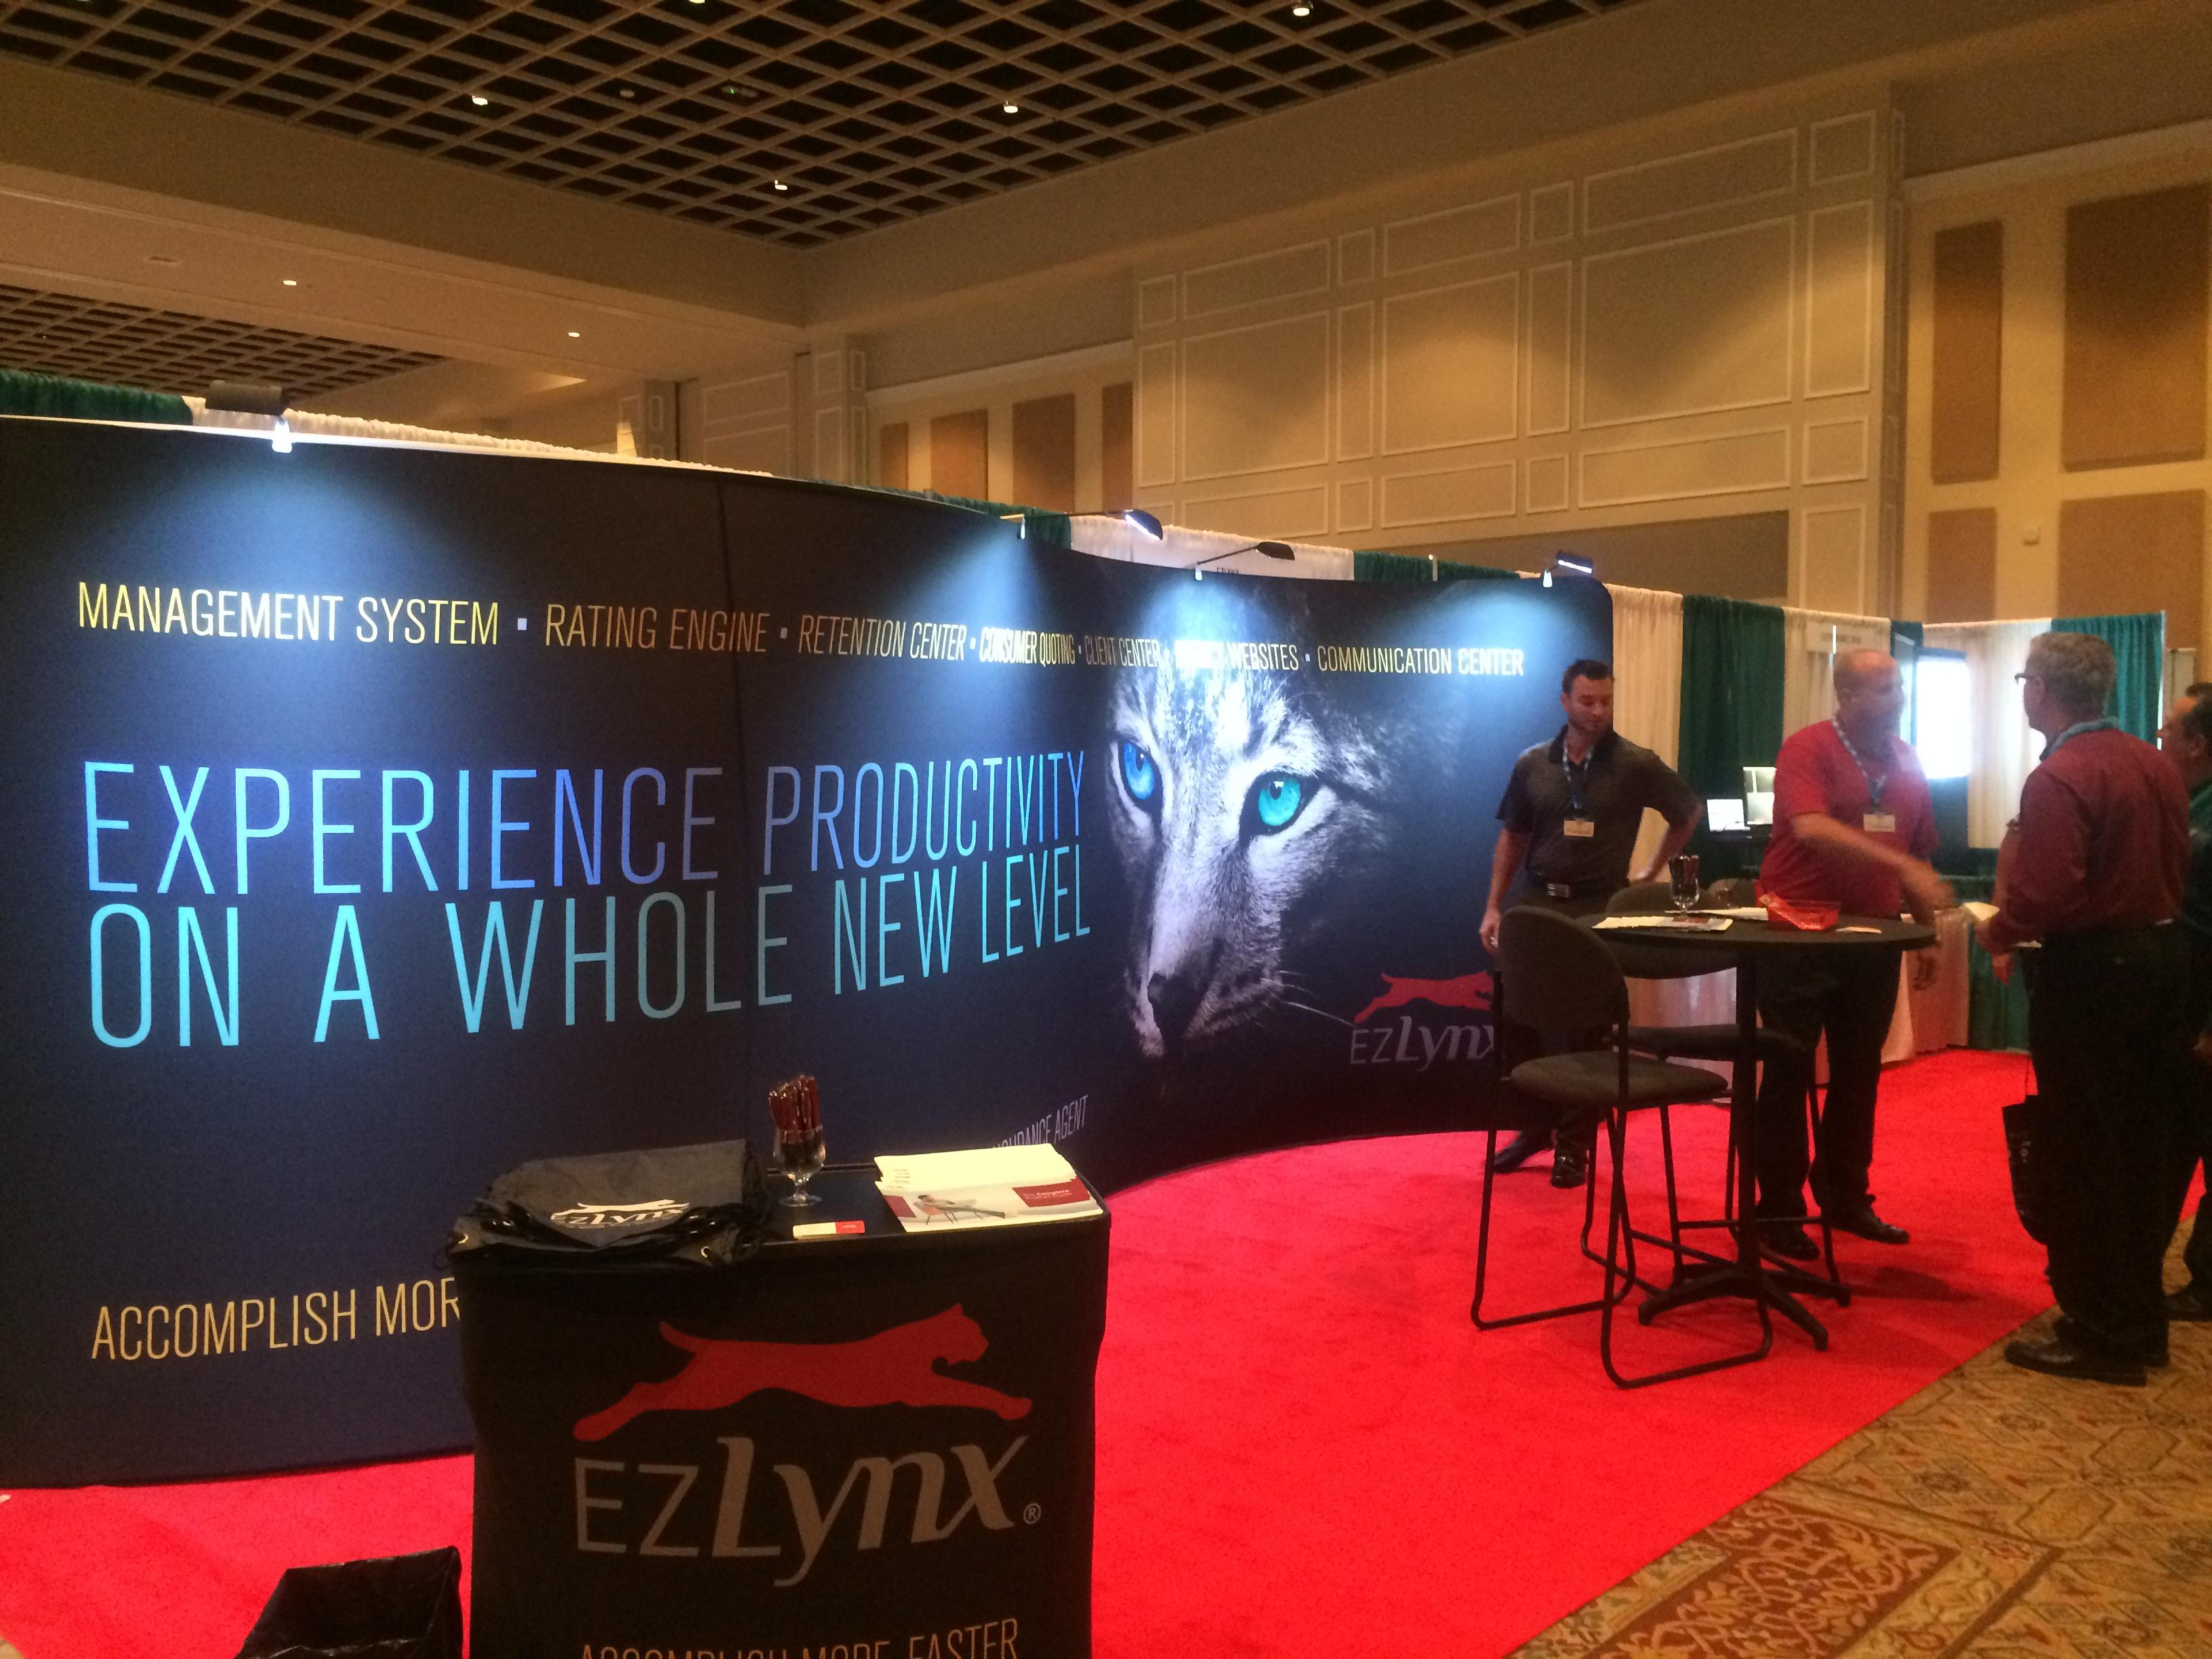 EZLynx Trade Show Booth